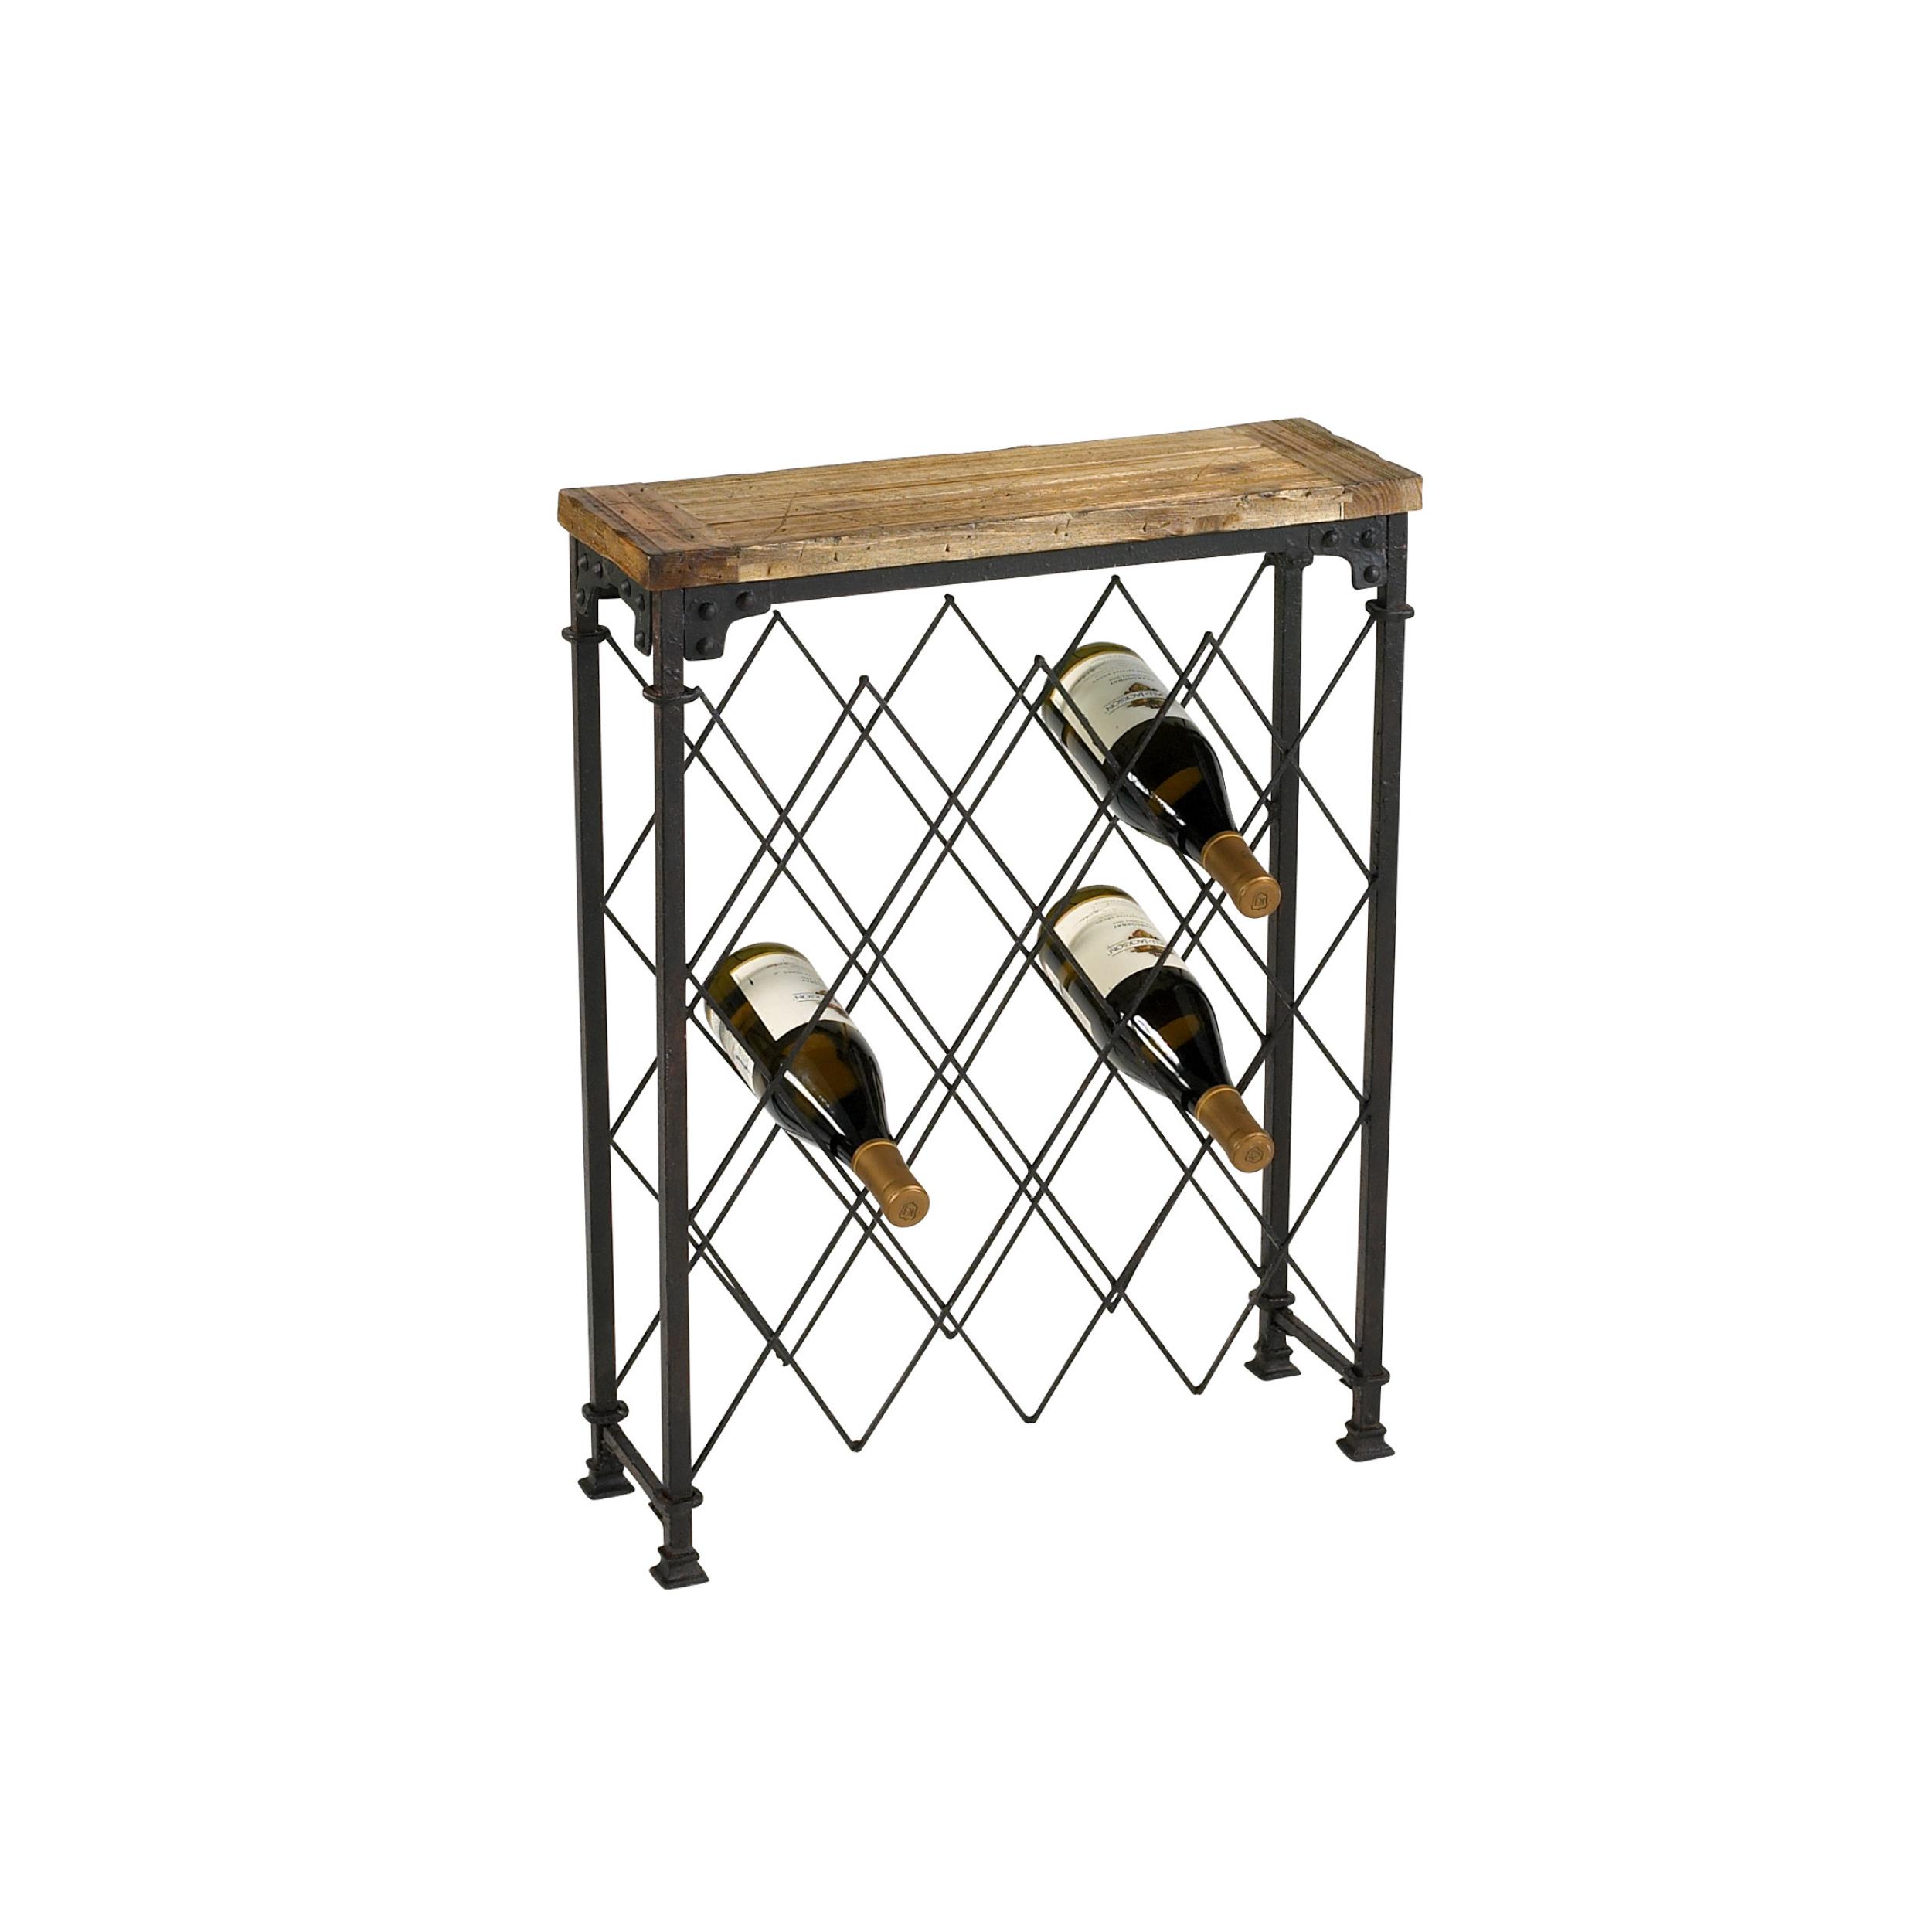 Hudson Wine Rack $152.00   Wants 1 Has 0 Needs 1